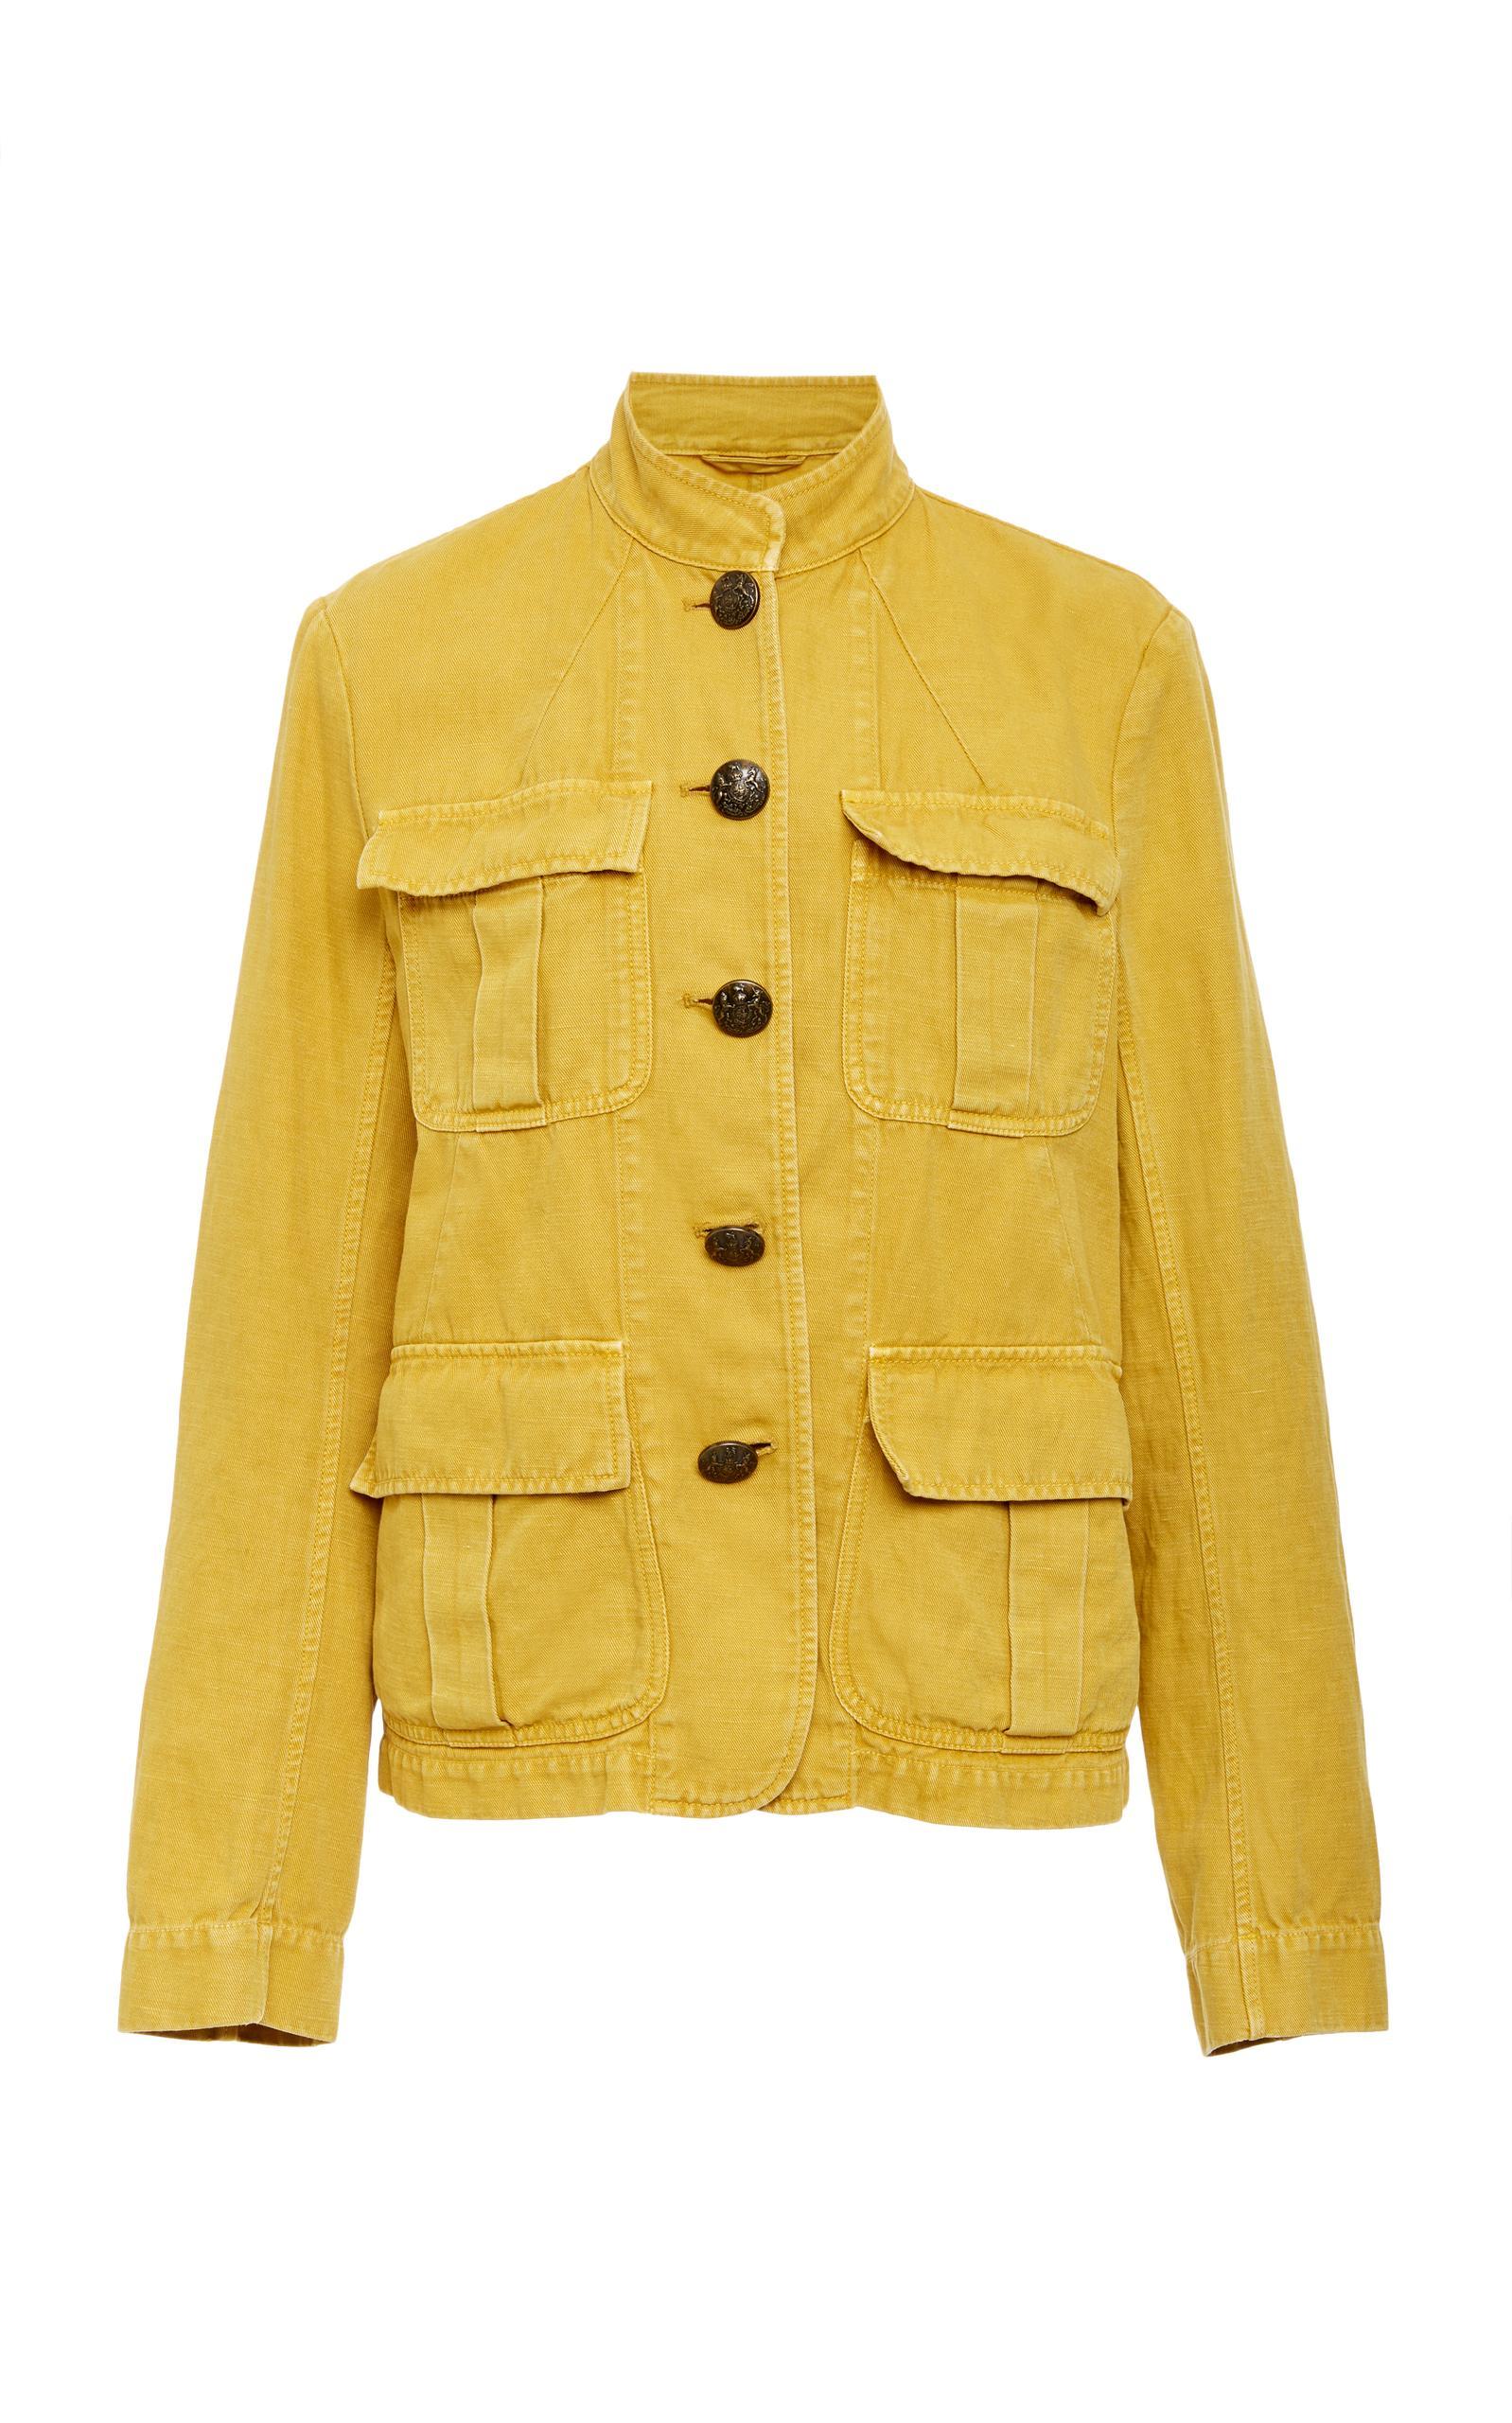 Nili Lotan Cambre Cotton-Linen Jacket - Mustard